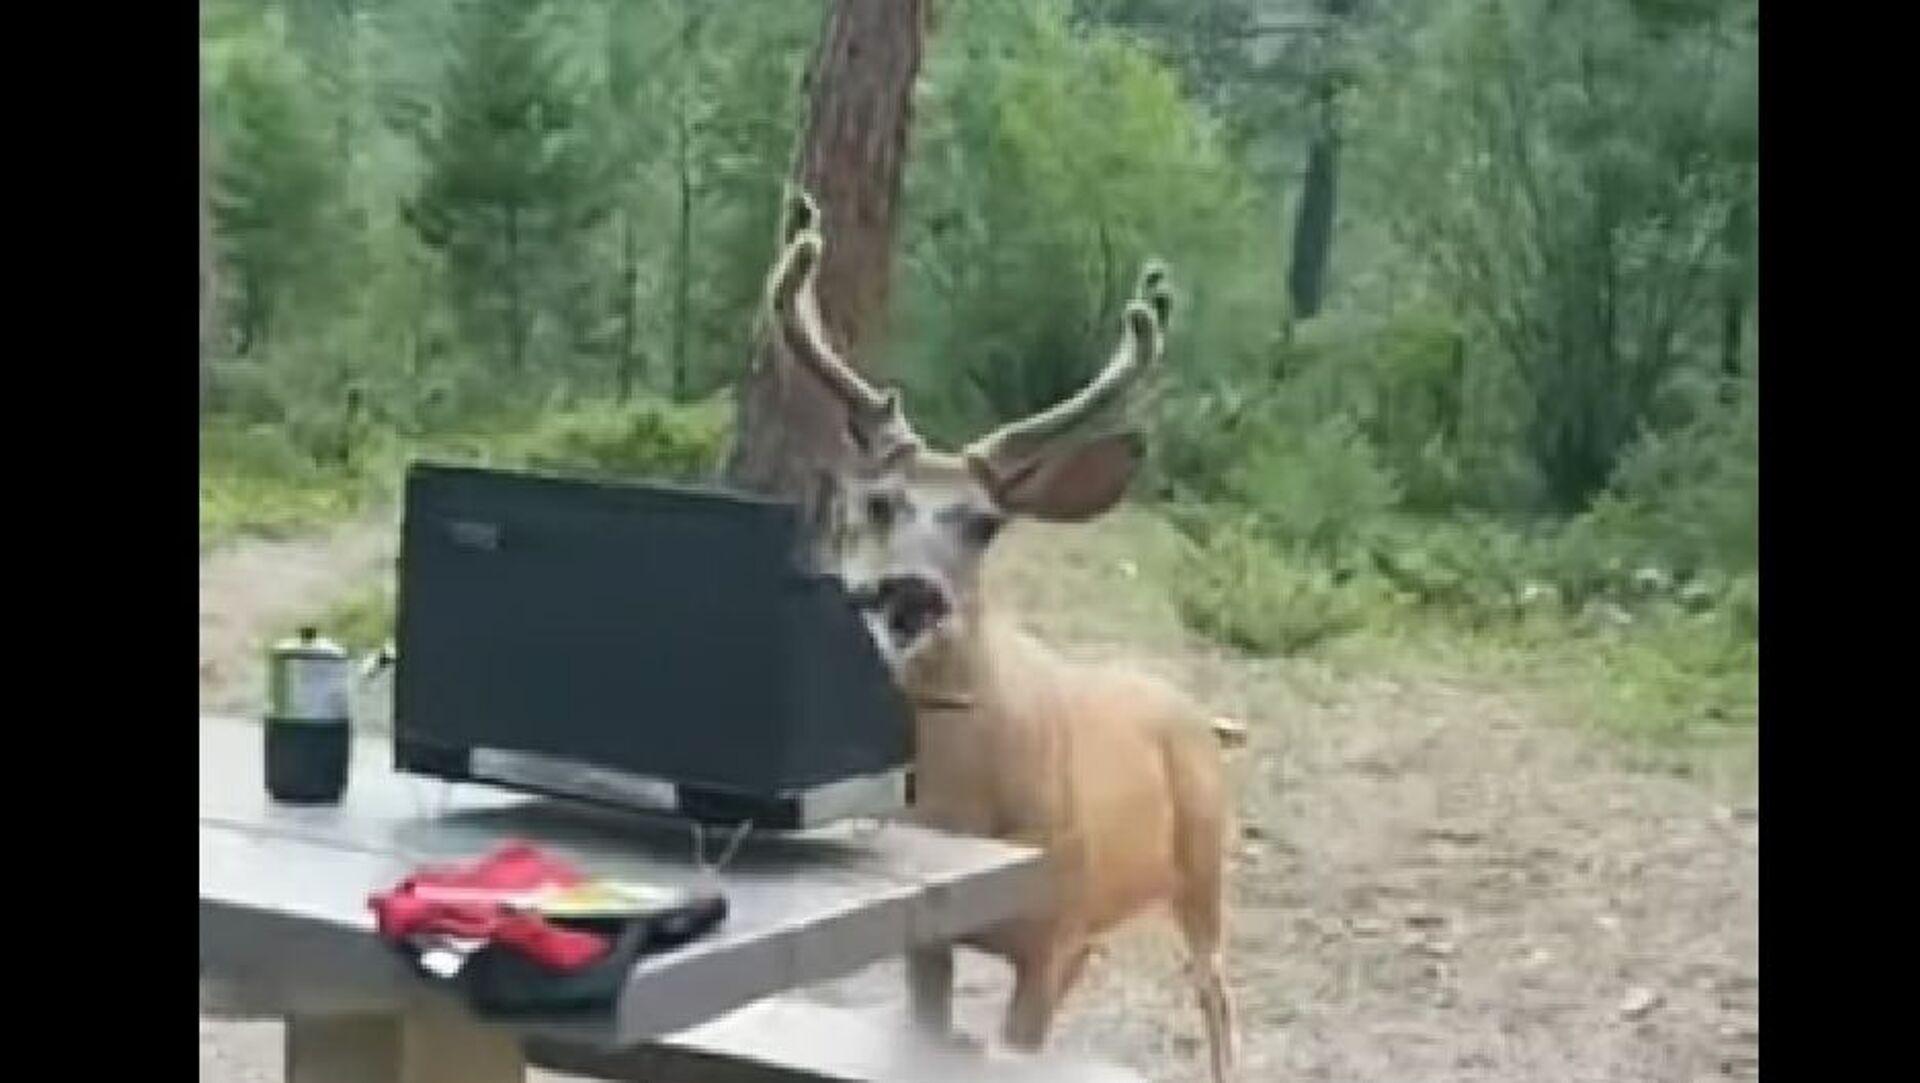 Deer Steals Hotdog - Sputnik International, 1920, 03.08.2021